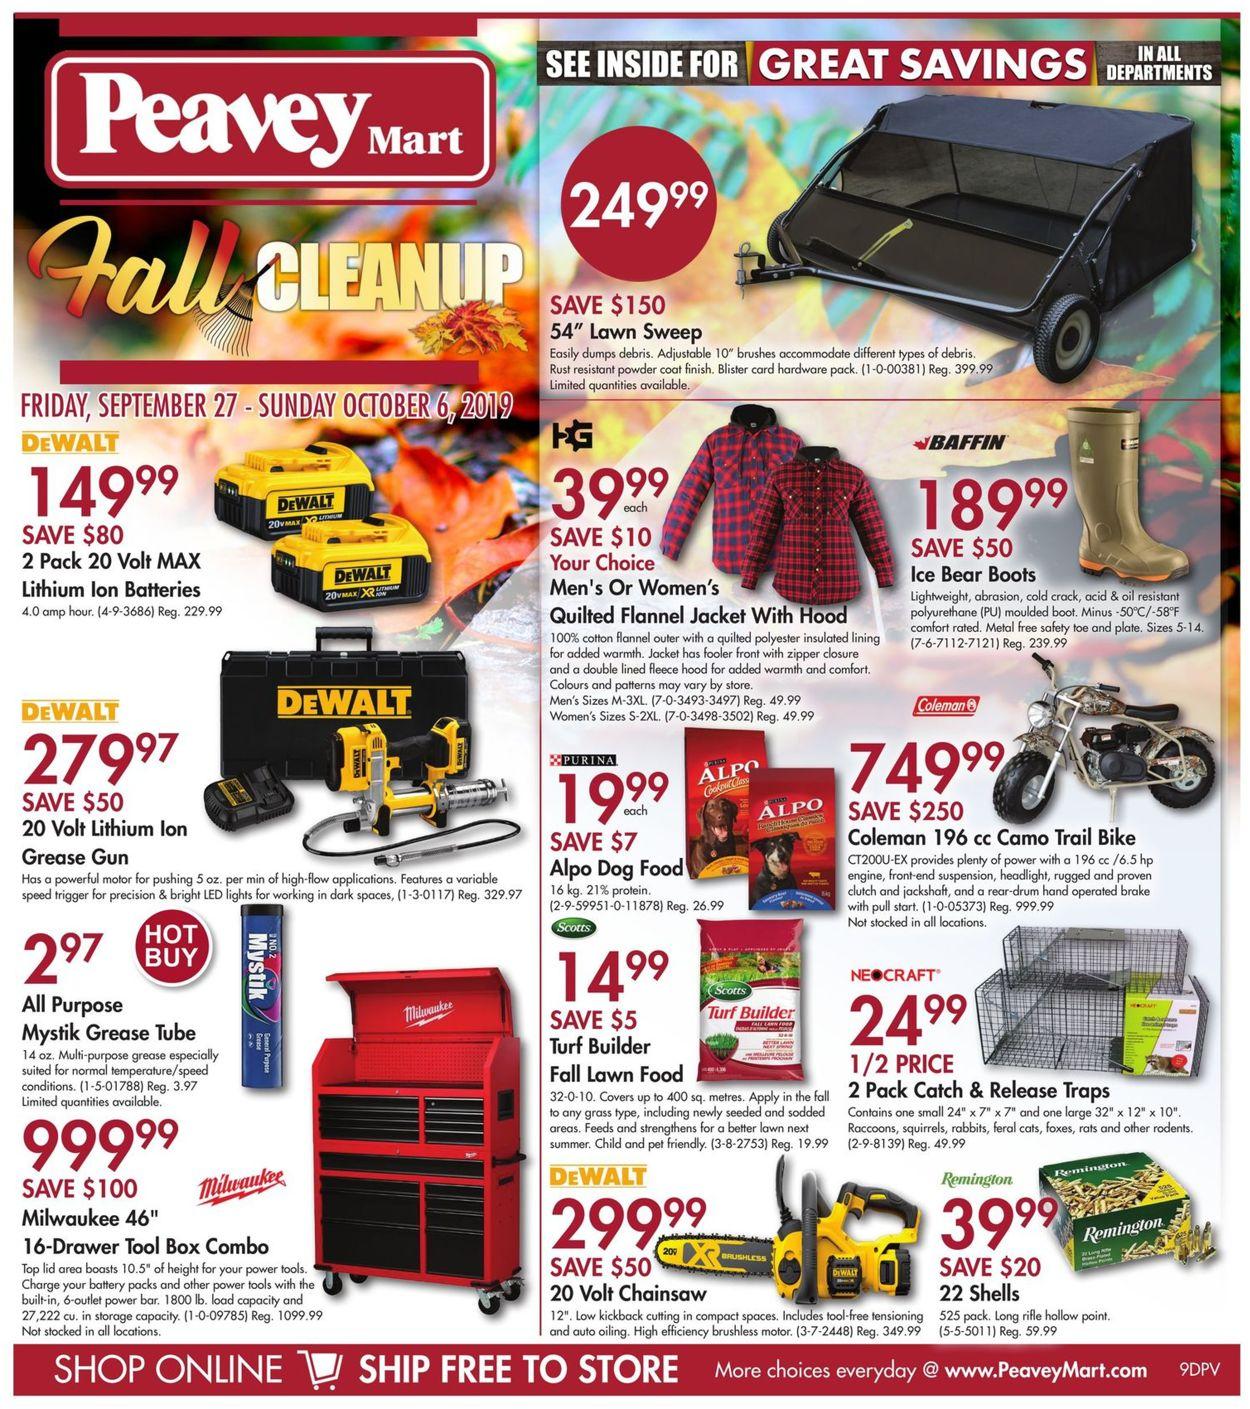 Peavey Mart Flyer - 09/27-10/06/2019